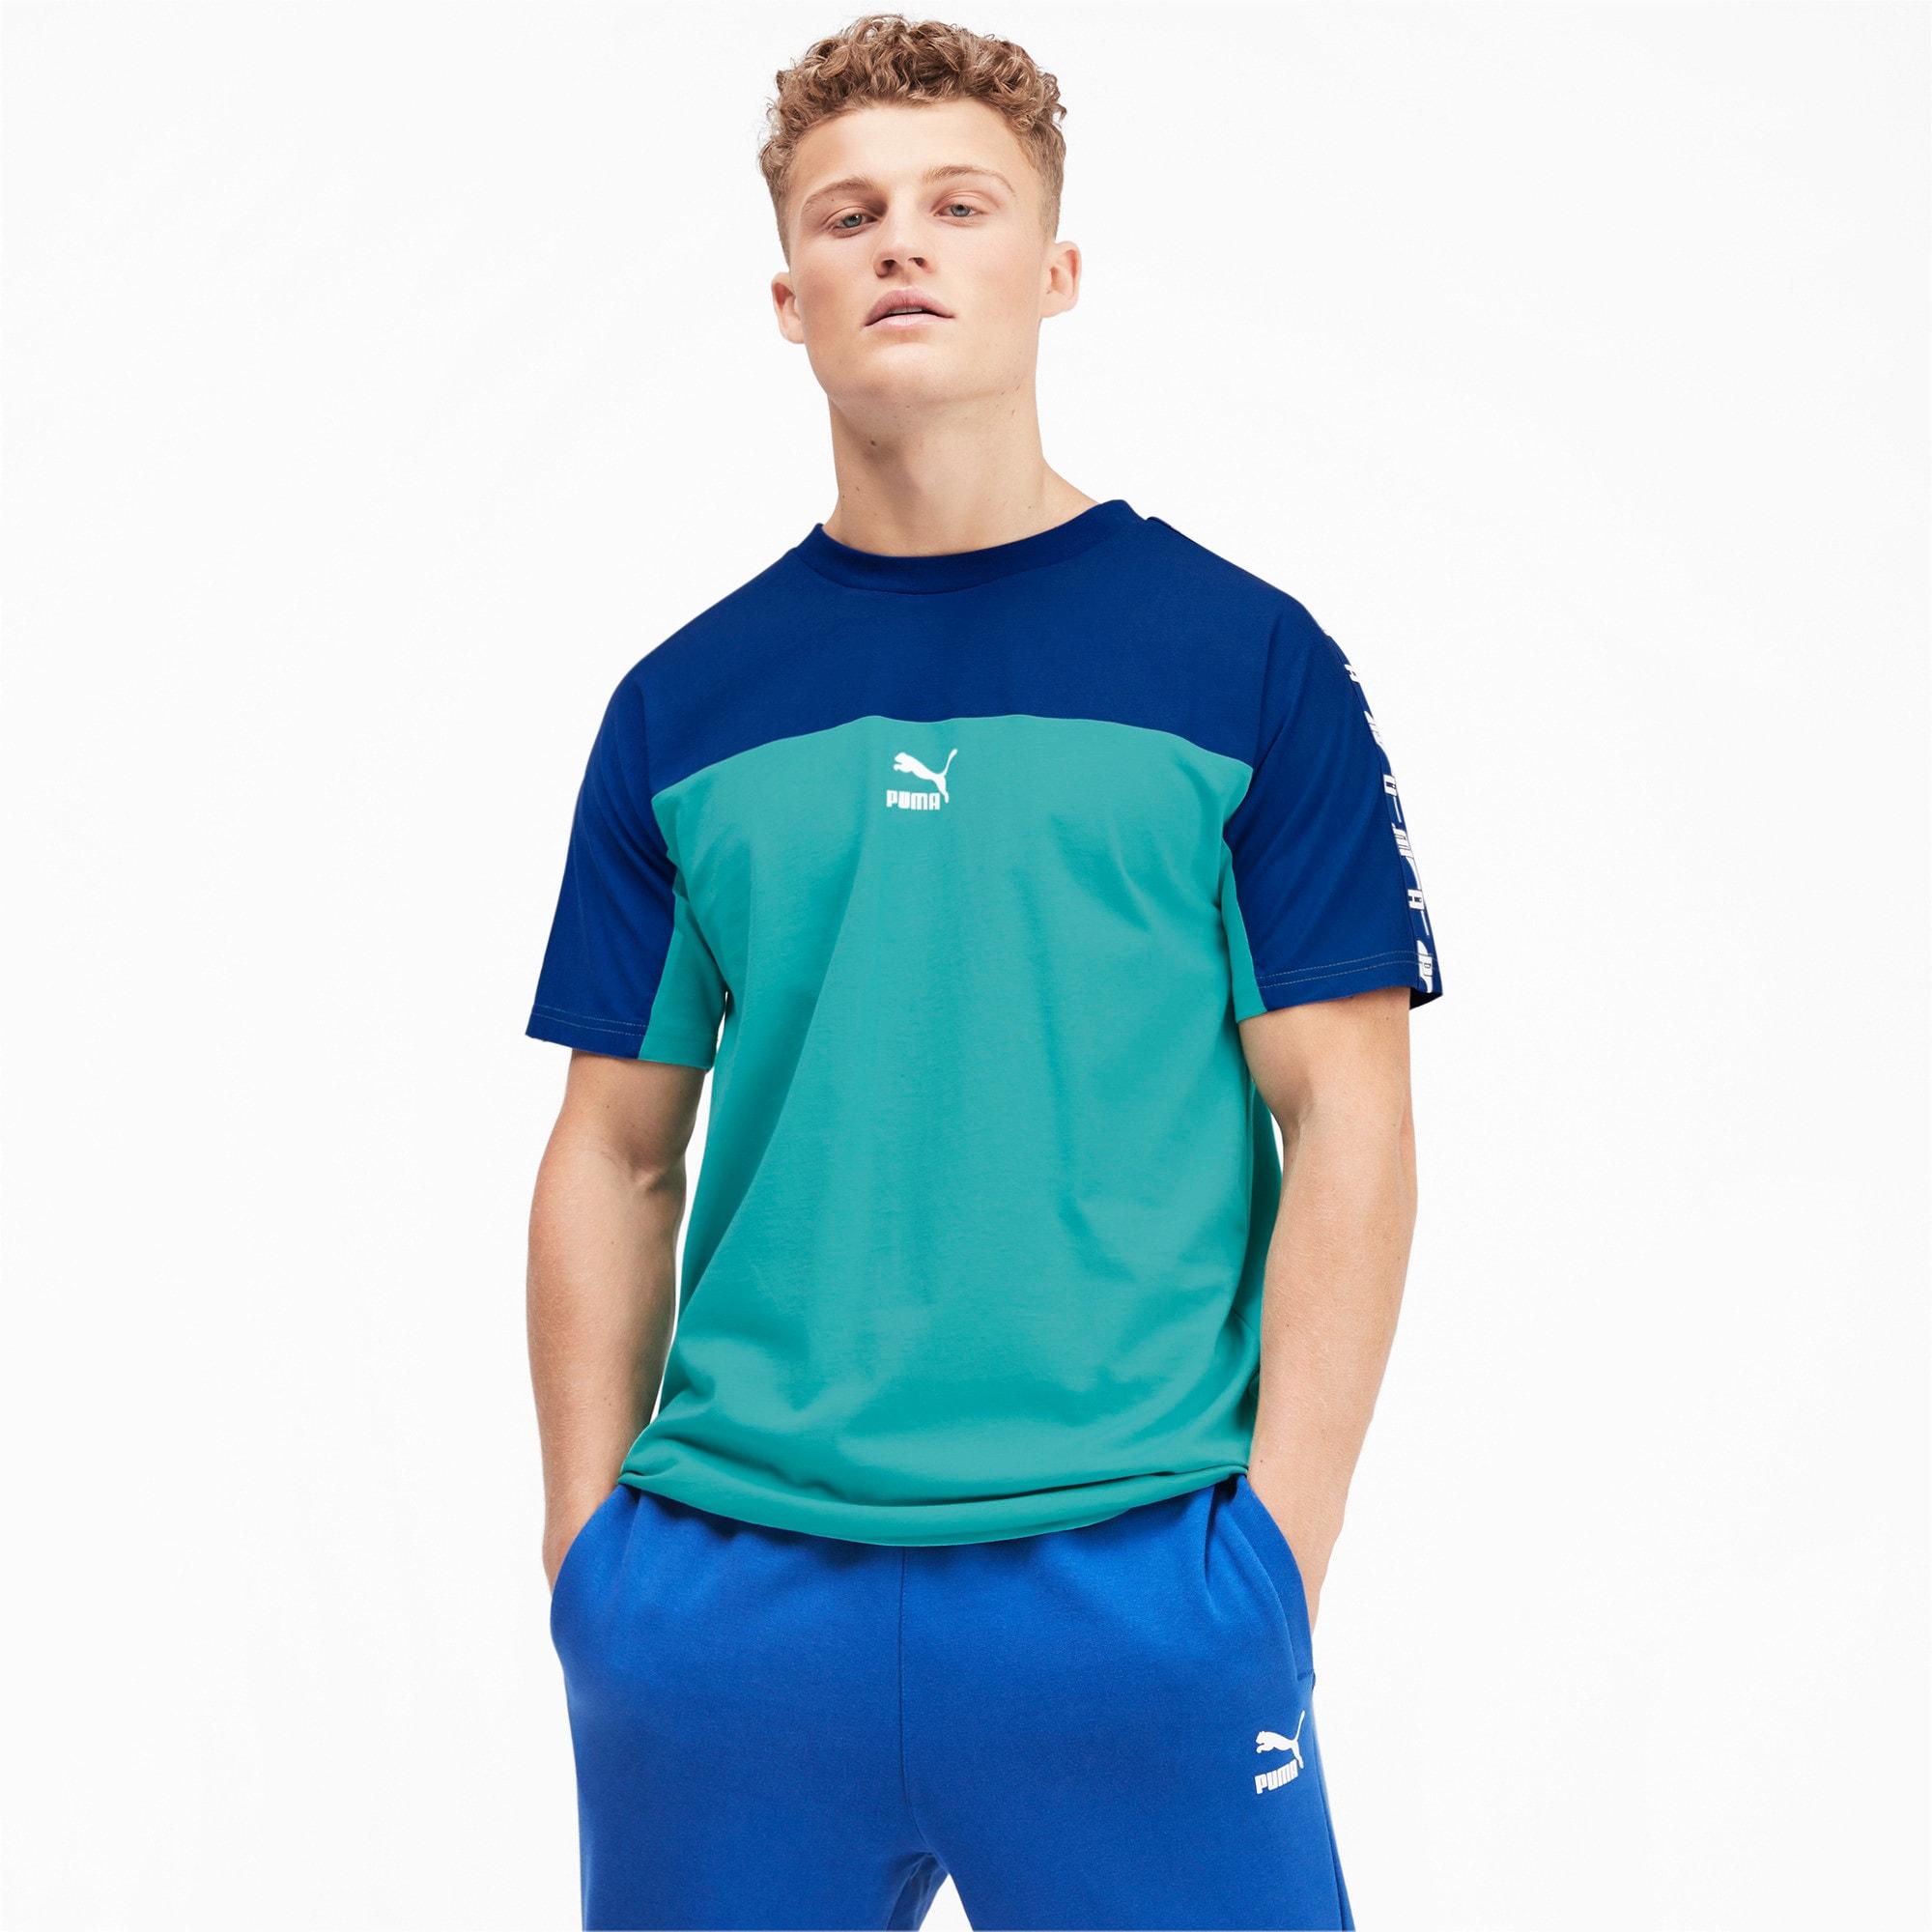 Thumbnail 2 of PUMA XTG SS Tシャツ 半袖, Blue Turquoise, medium-JPN